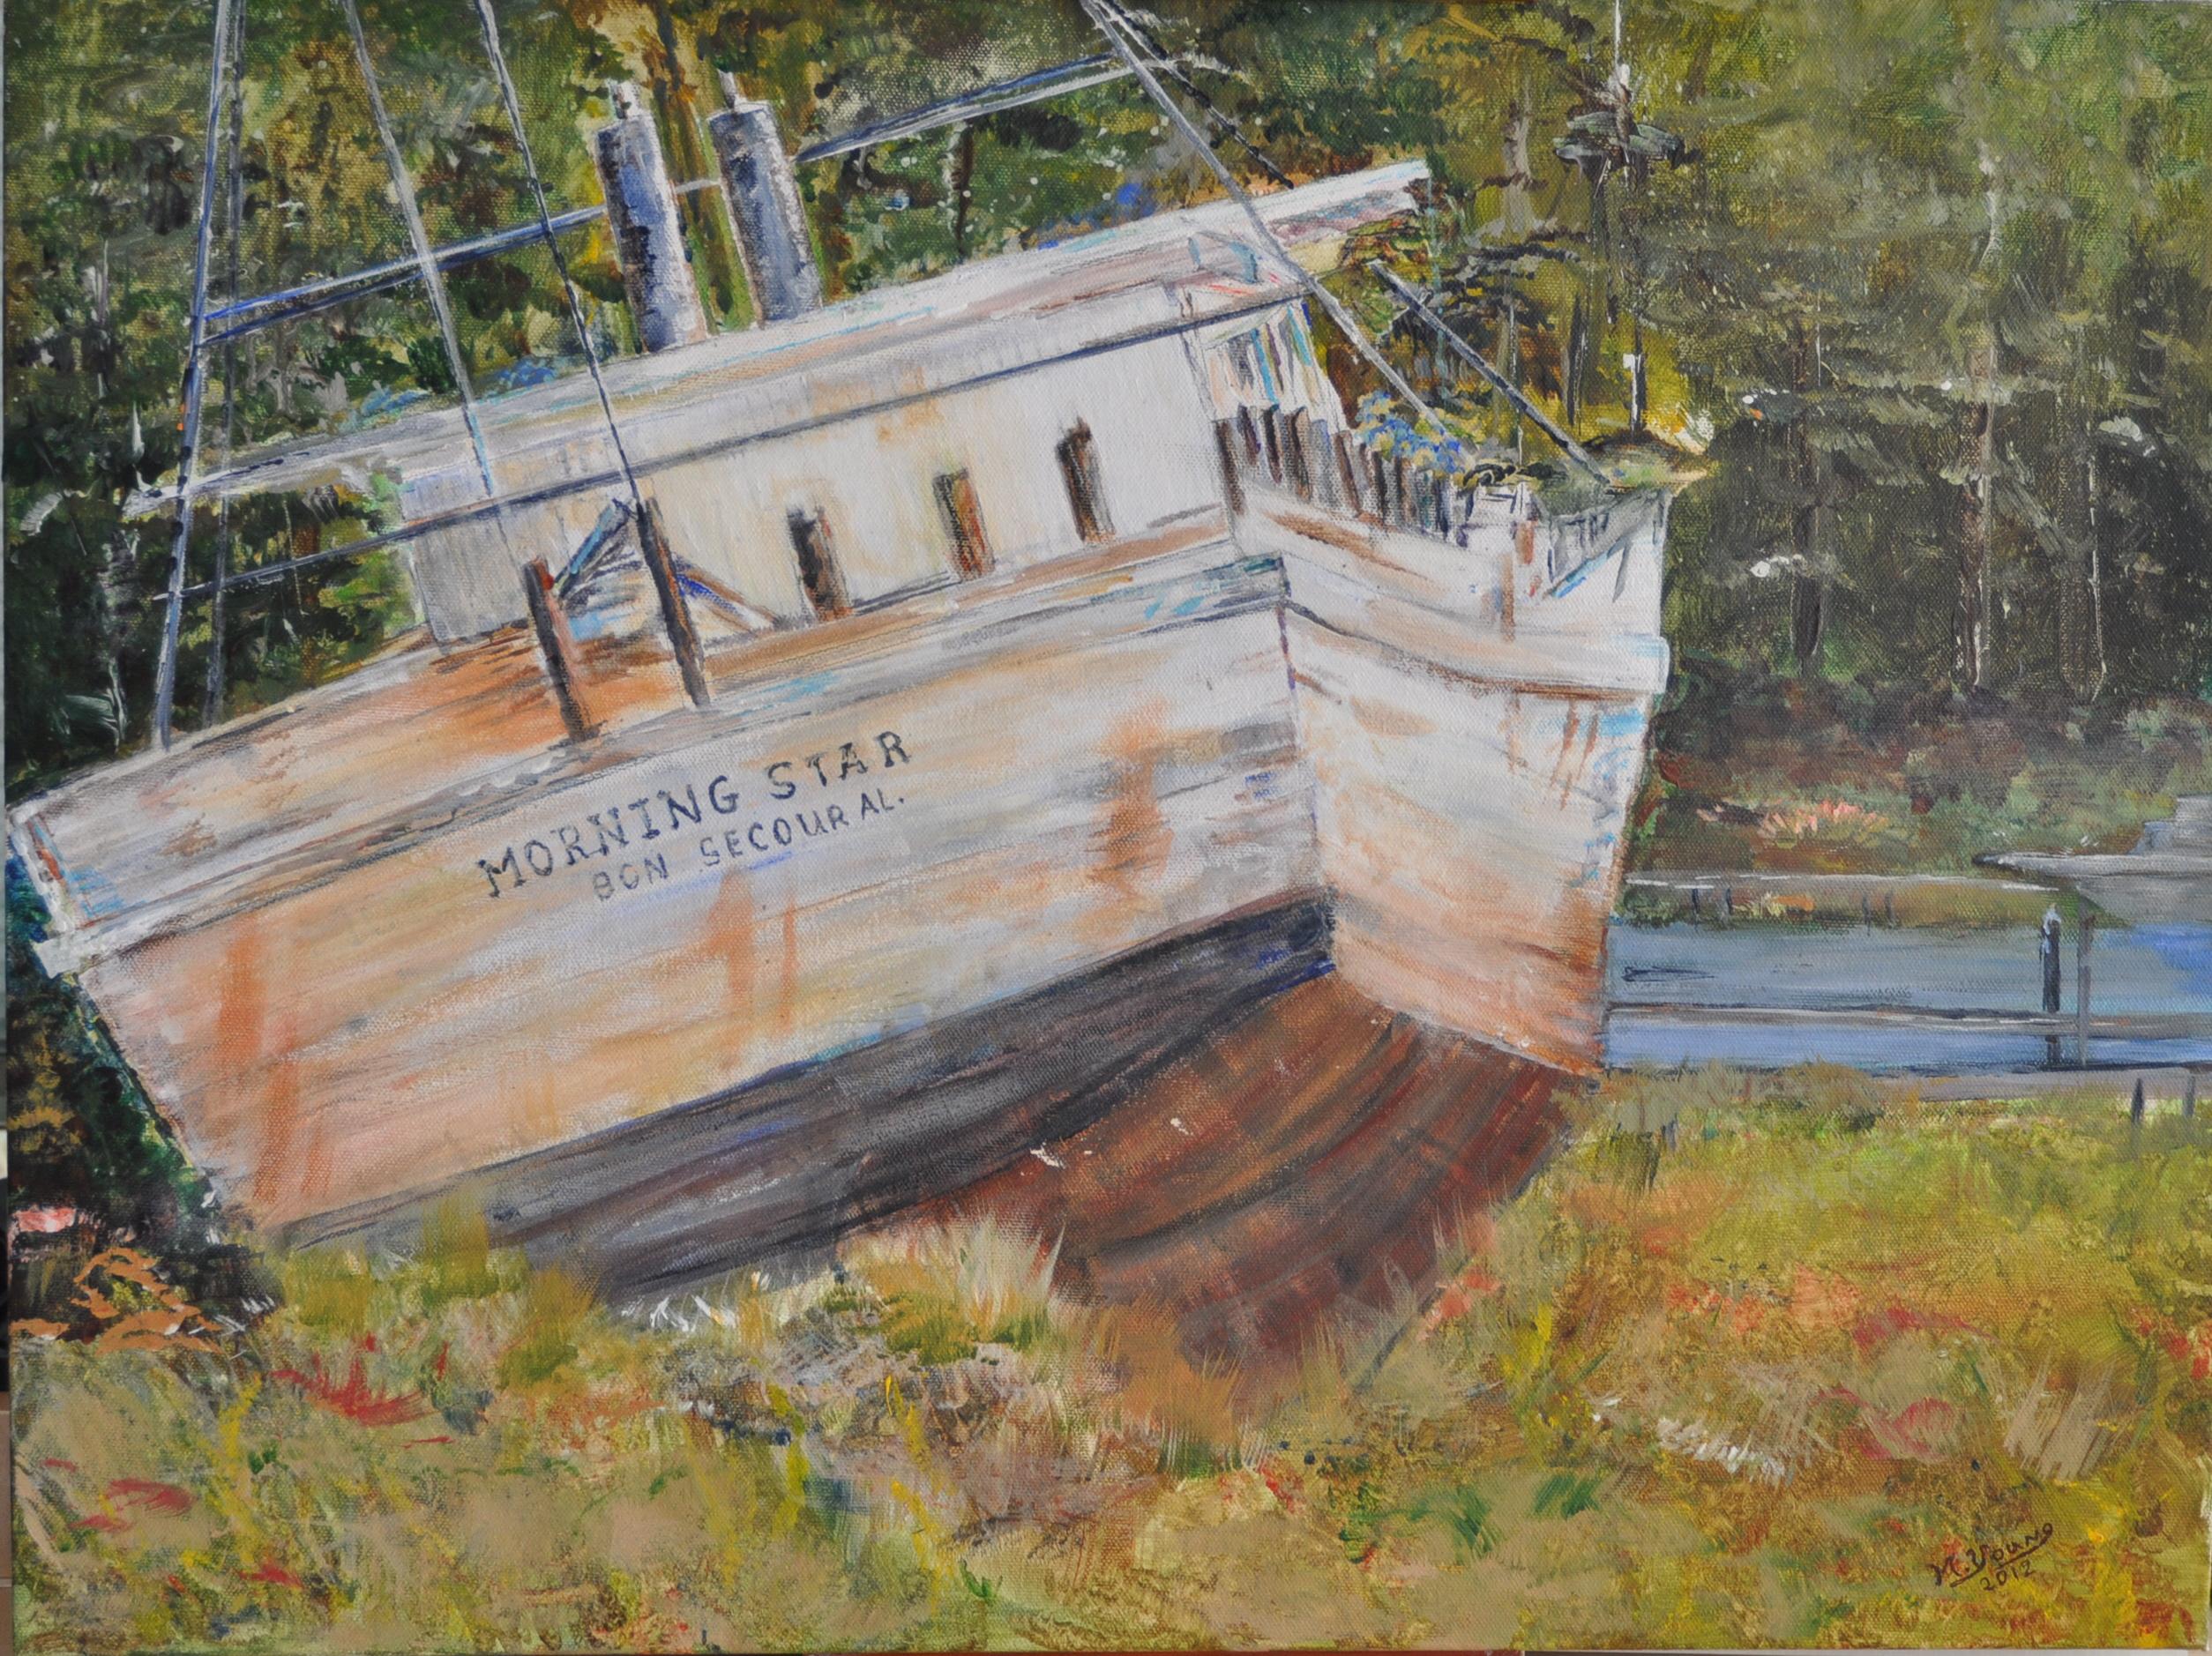 Shrimp Boat Bon Secour Al._09 22 2012 07 57_0001.JPG